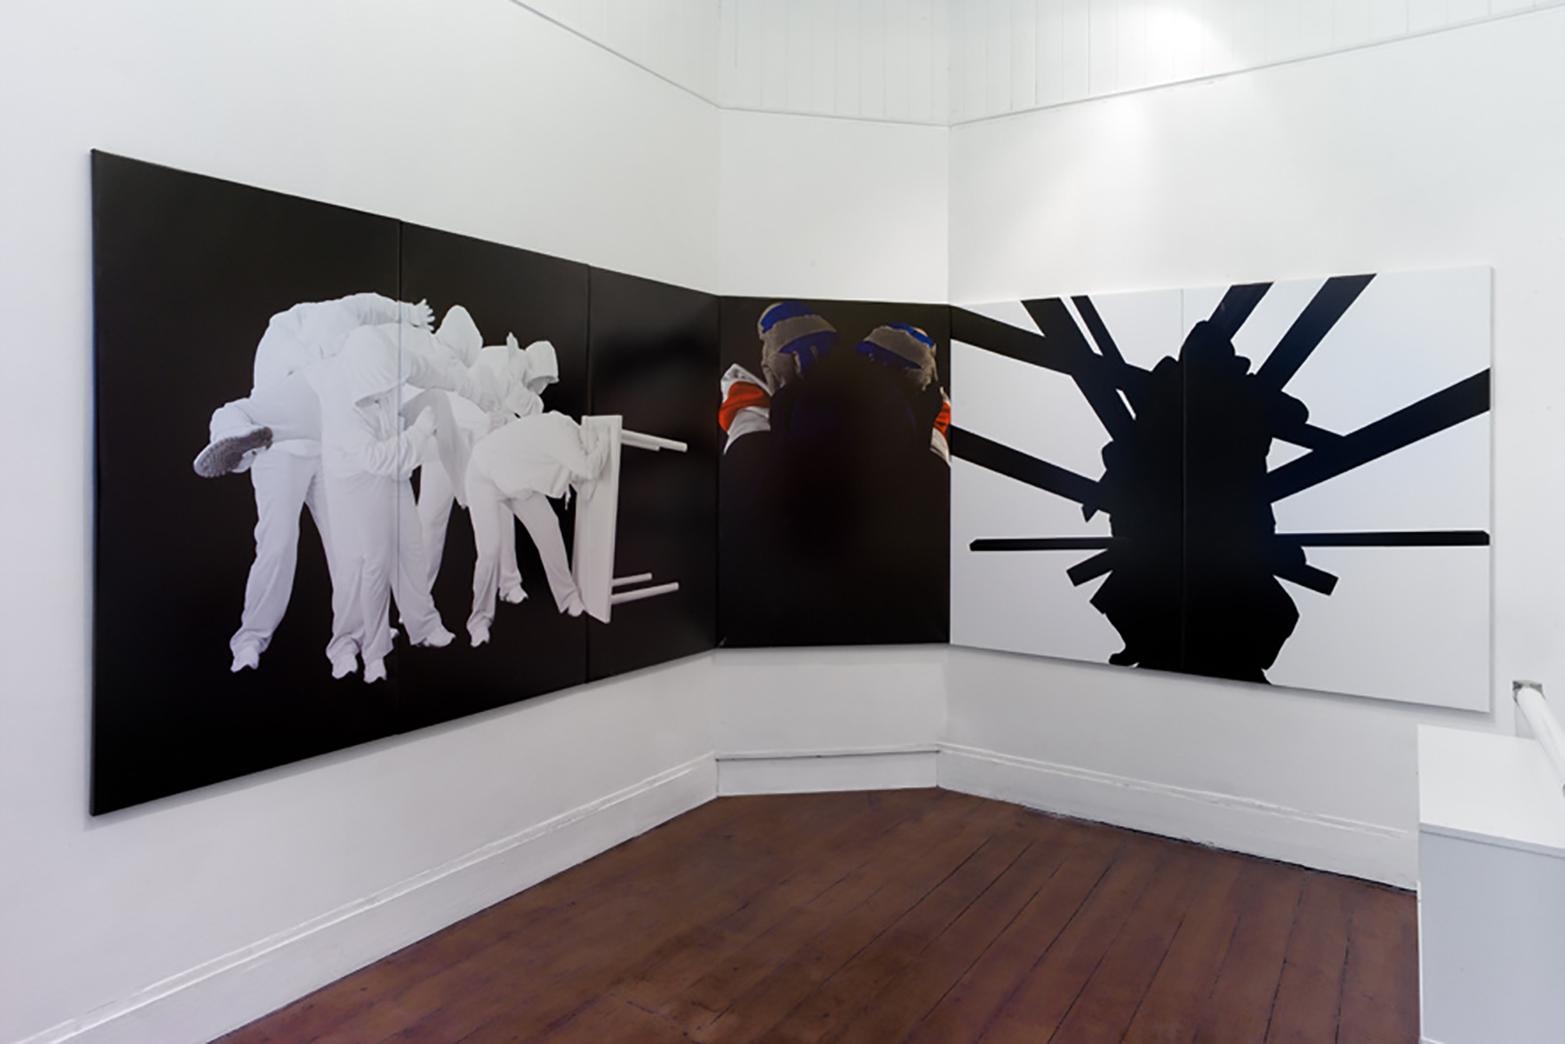 Tina Hage, Gestalt (statur #203), Gestalt (build #101)  and Gestalt (guise #023), 2011